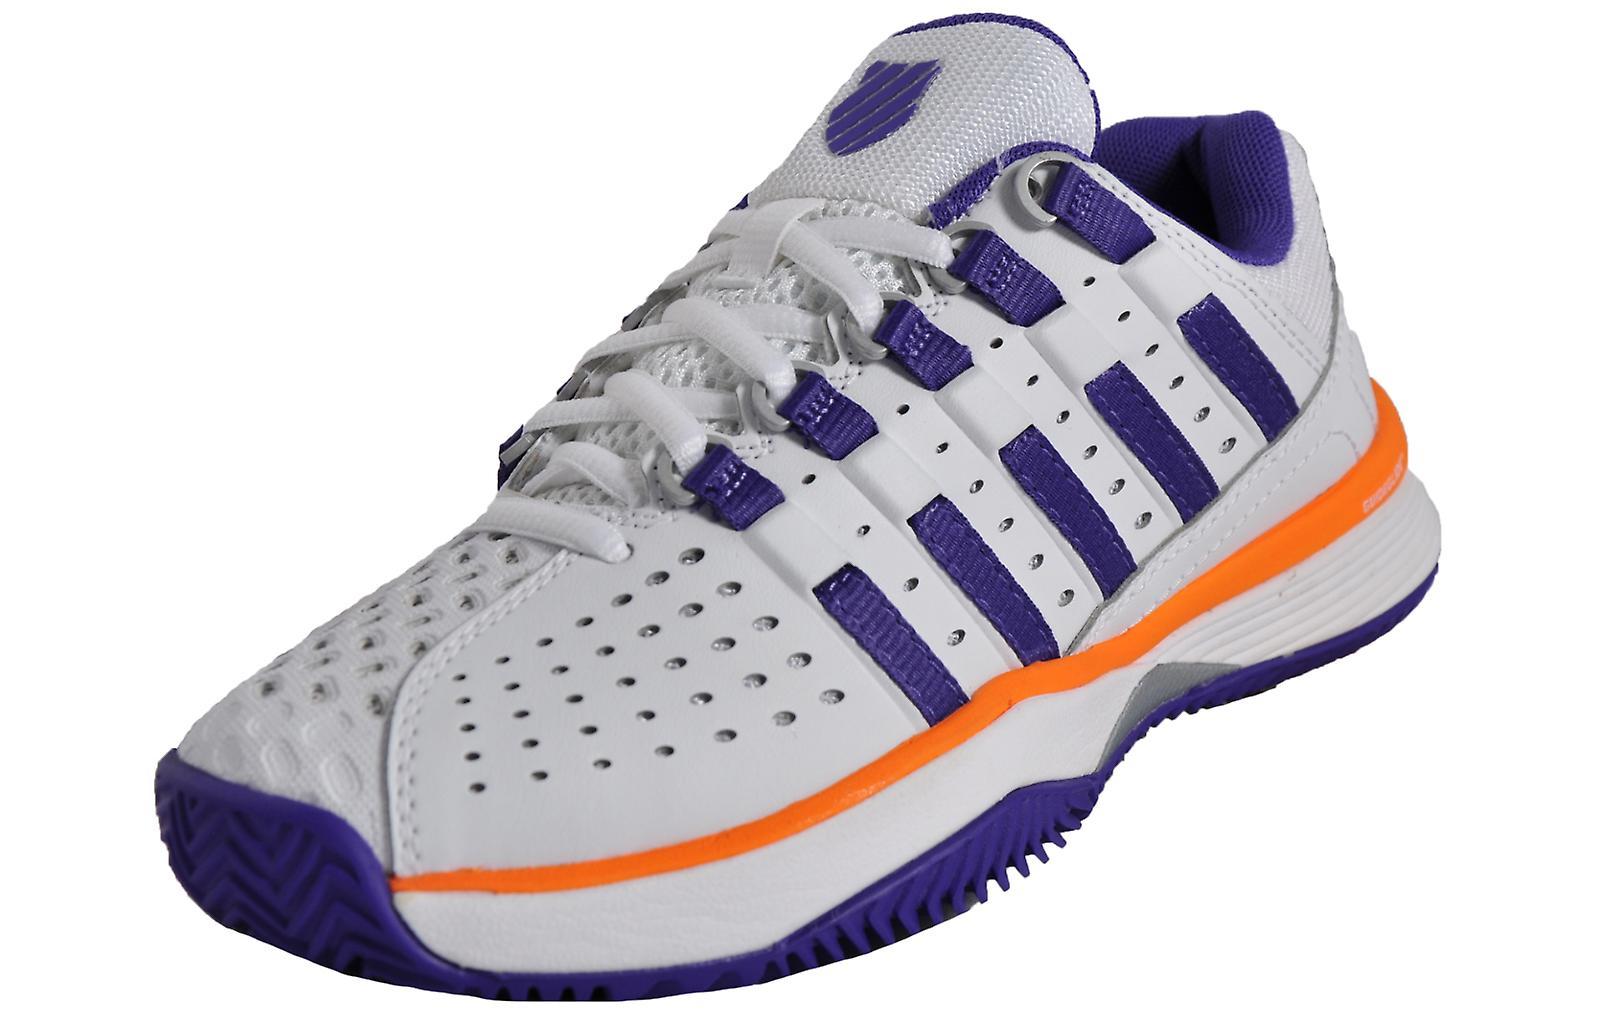 K Swiss Hypercourt HB White/Purple/Orange fzVcJ